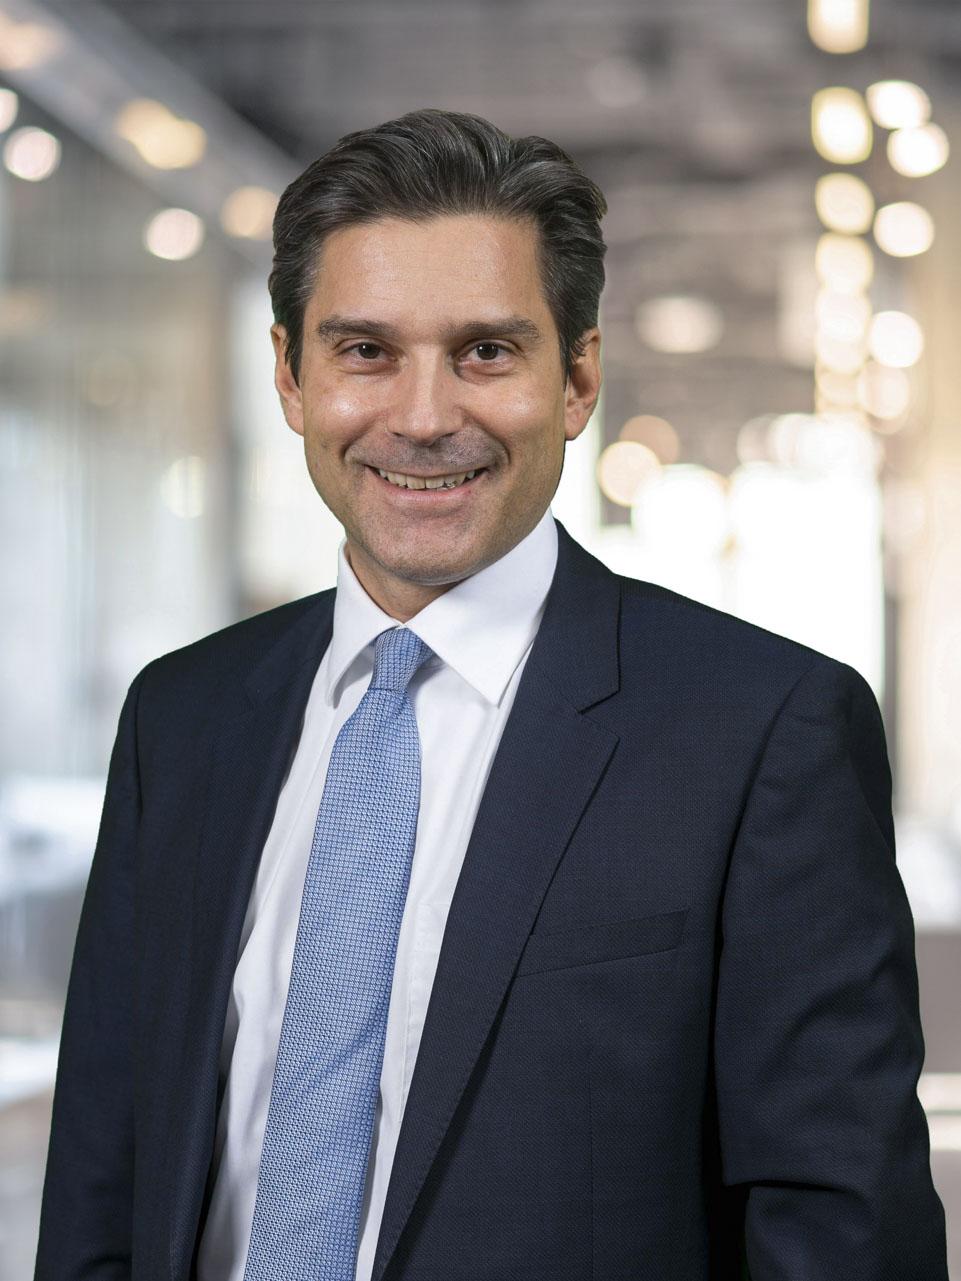 Salzburger Notariatskammer: Dr. Thomas Schatzl LL.M